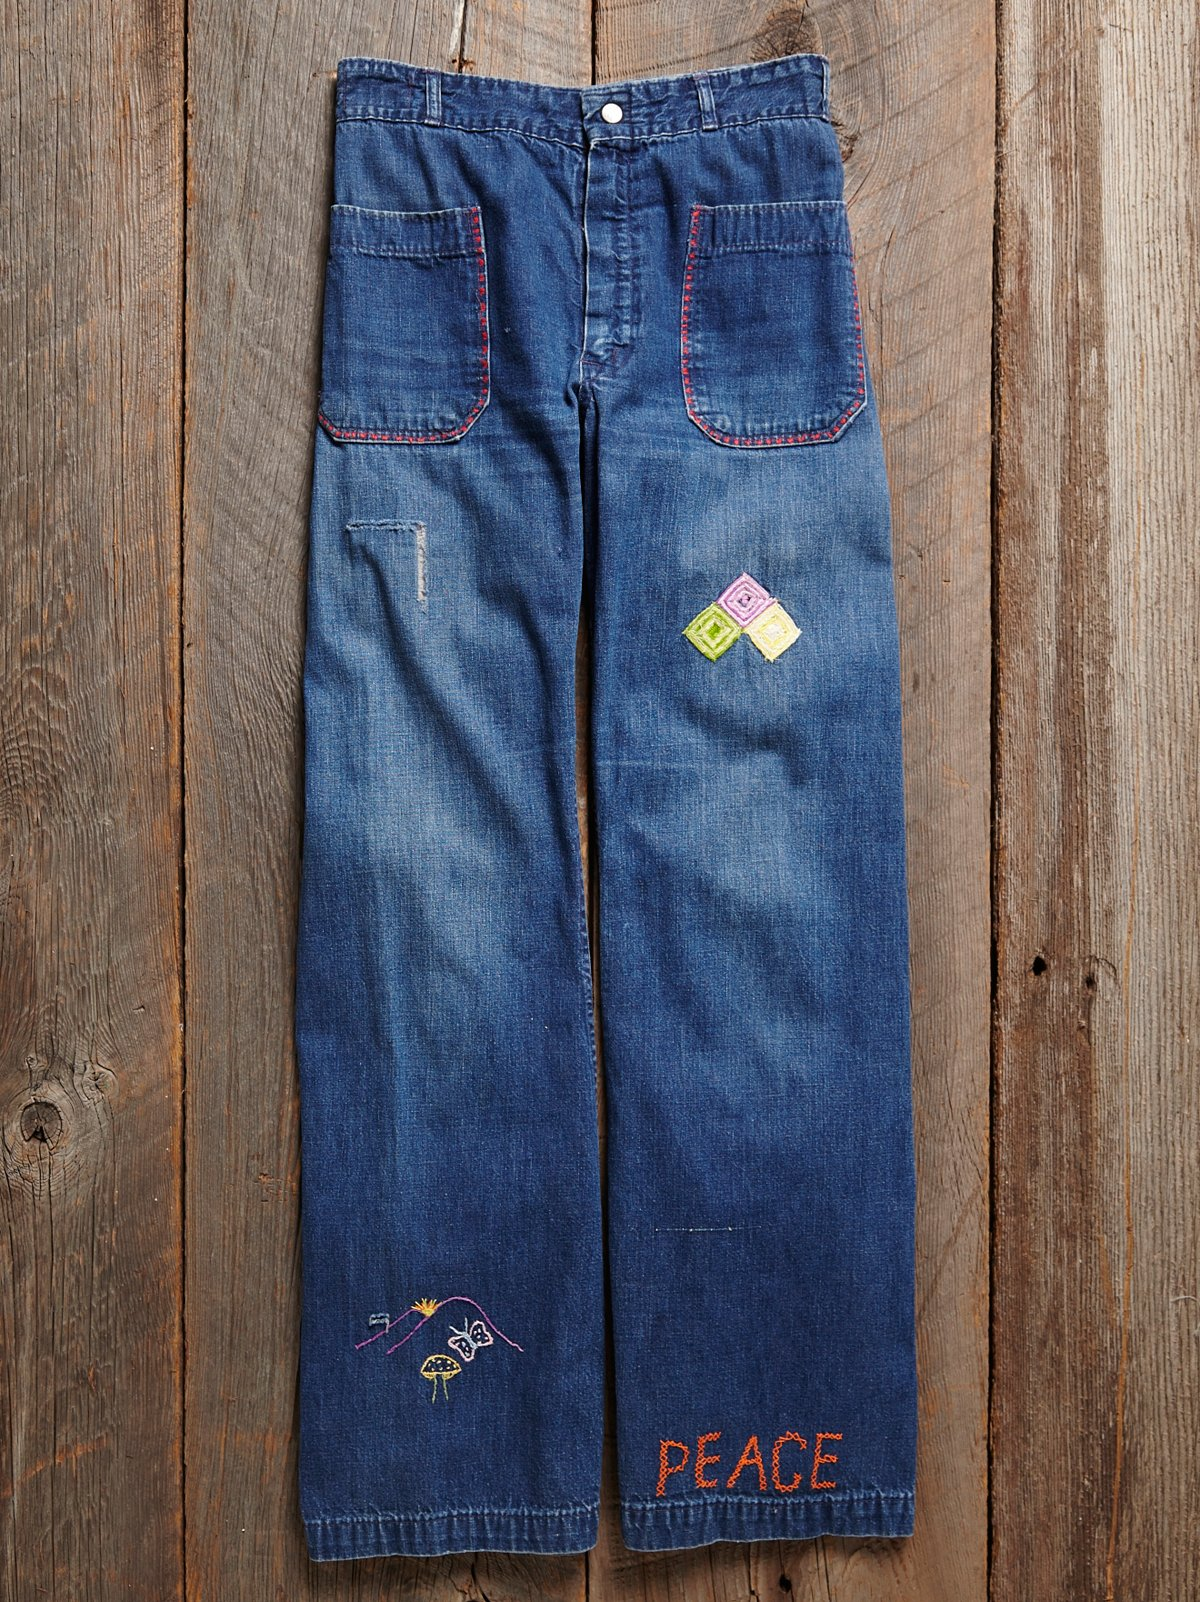 Vintage 1970s Patchwork Jeans